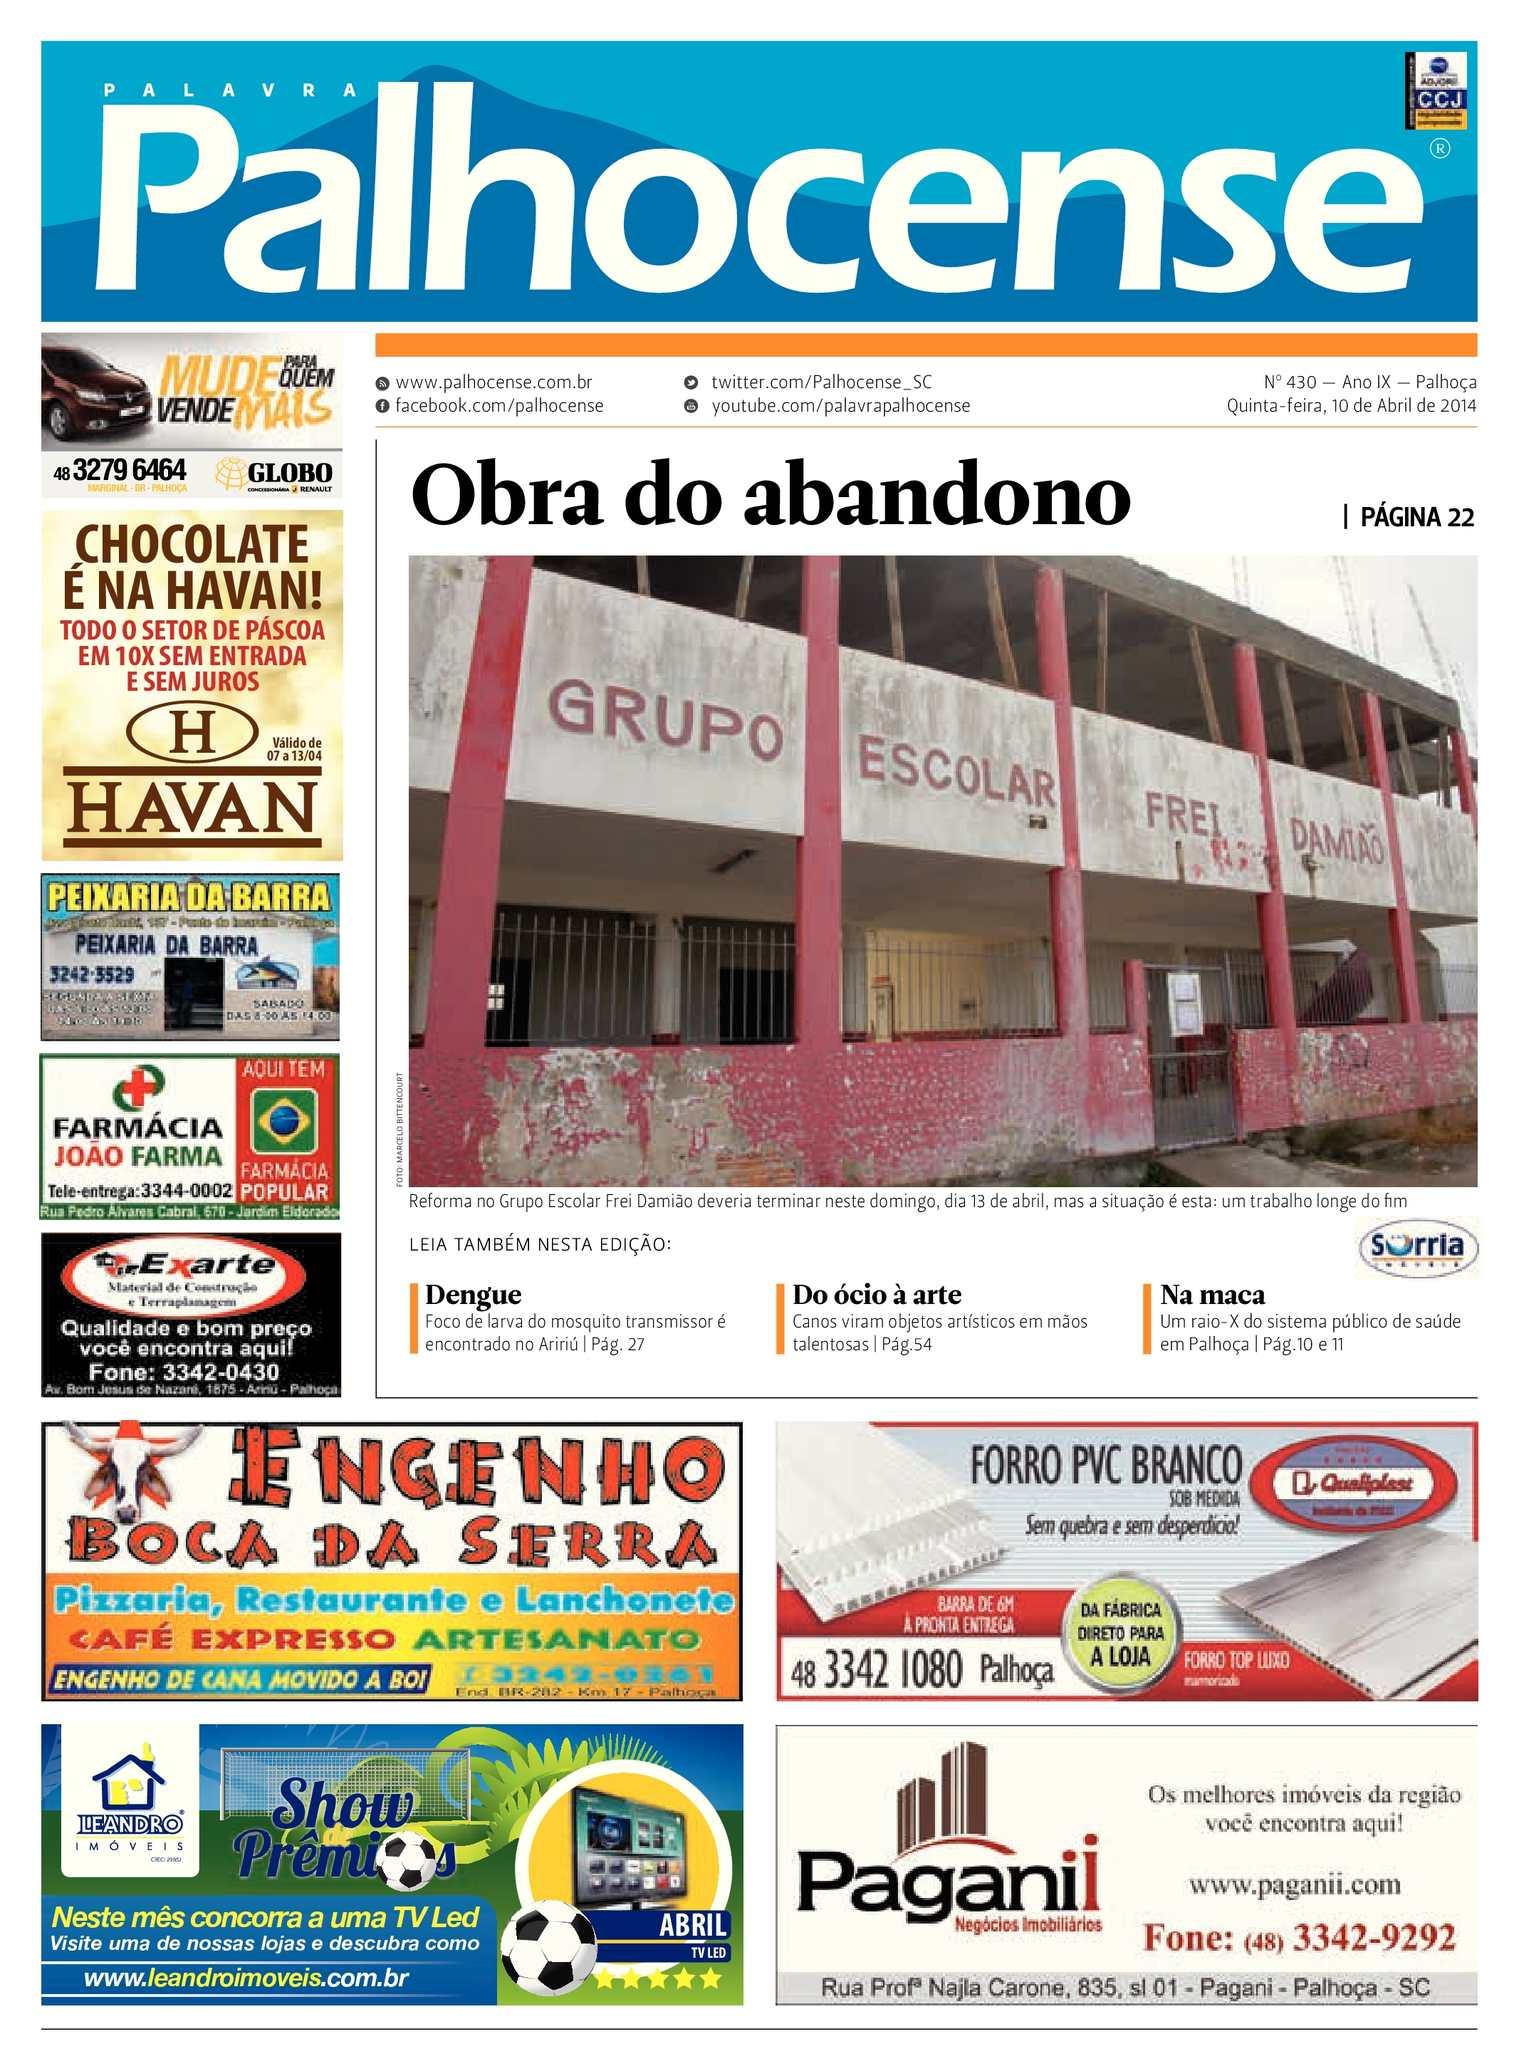 4bef760123 Calaméo - Jornal Palavra Palhocense - Edição 430